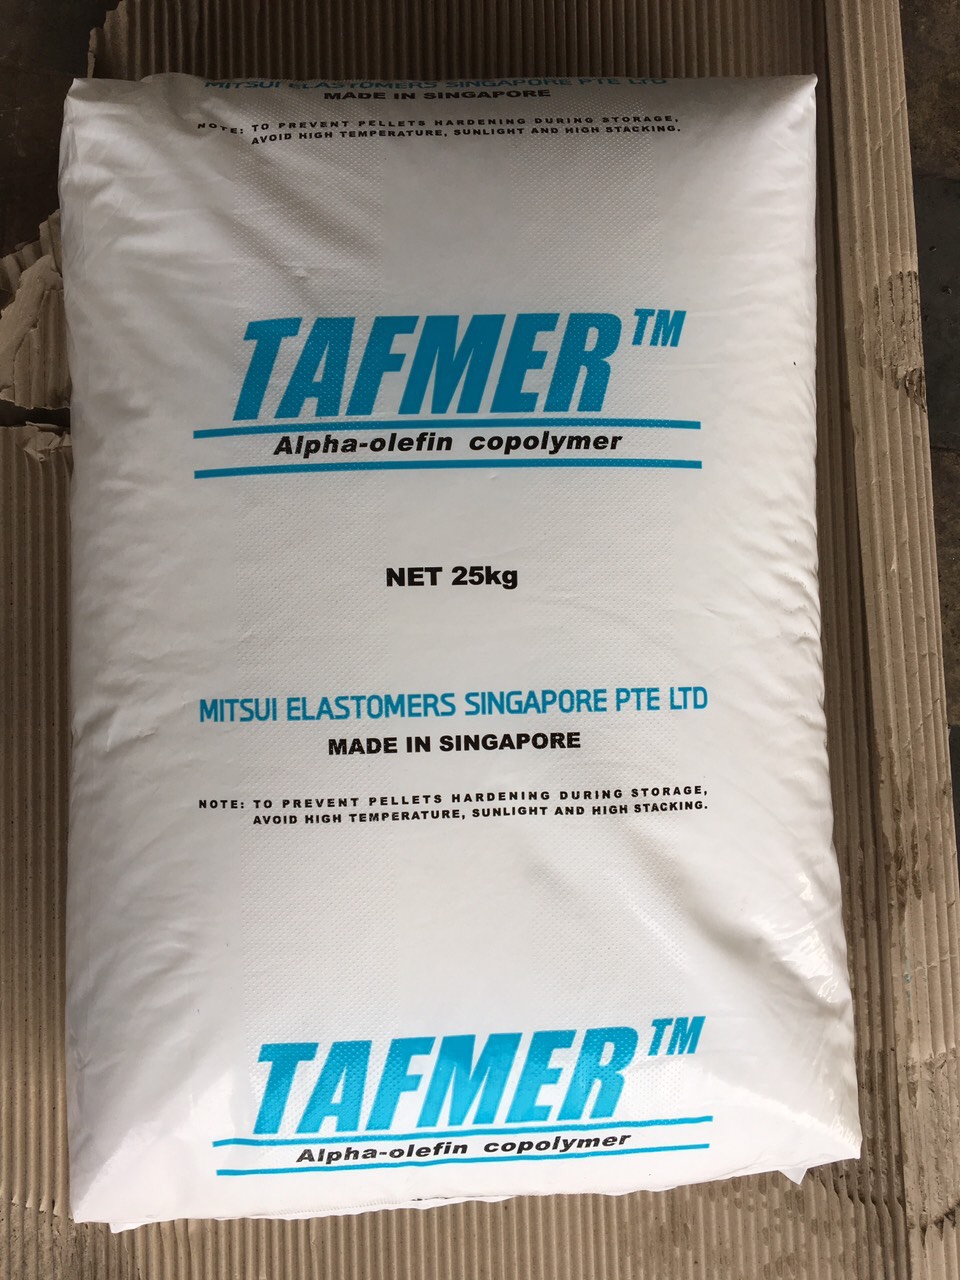 TAFMER - Alpha olefin copolymer